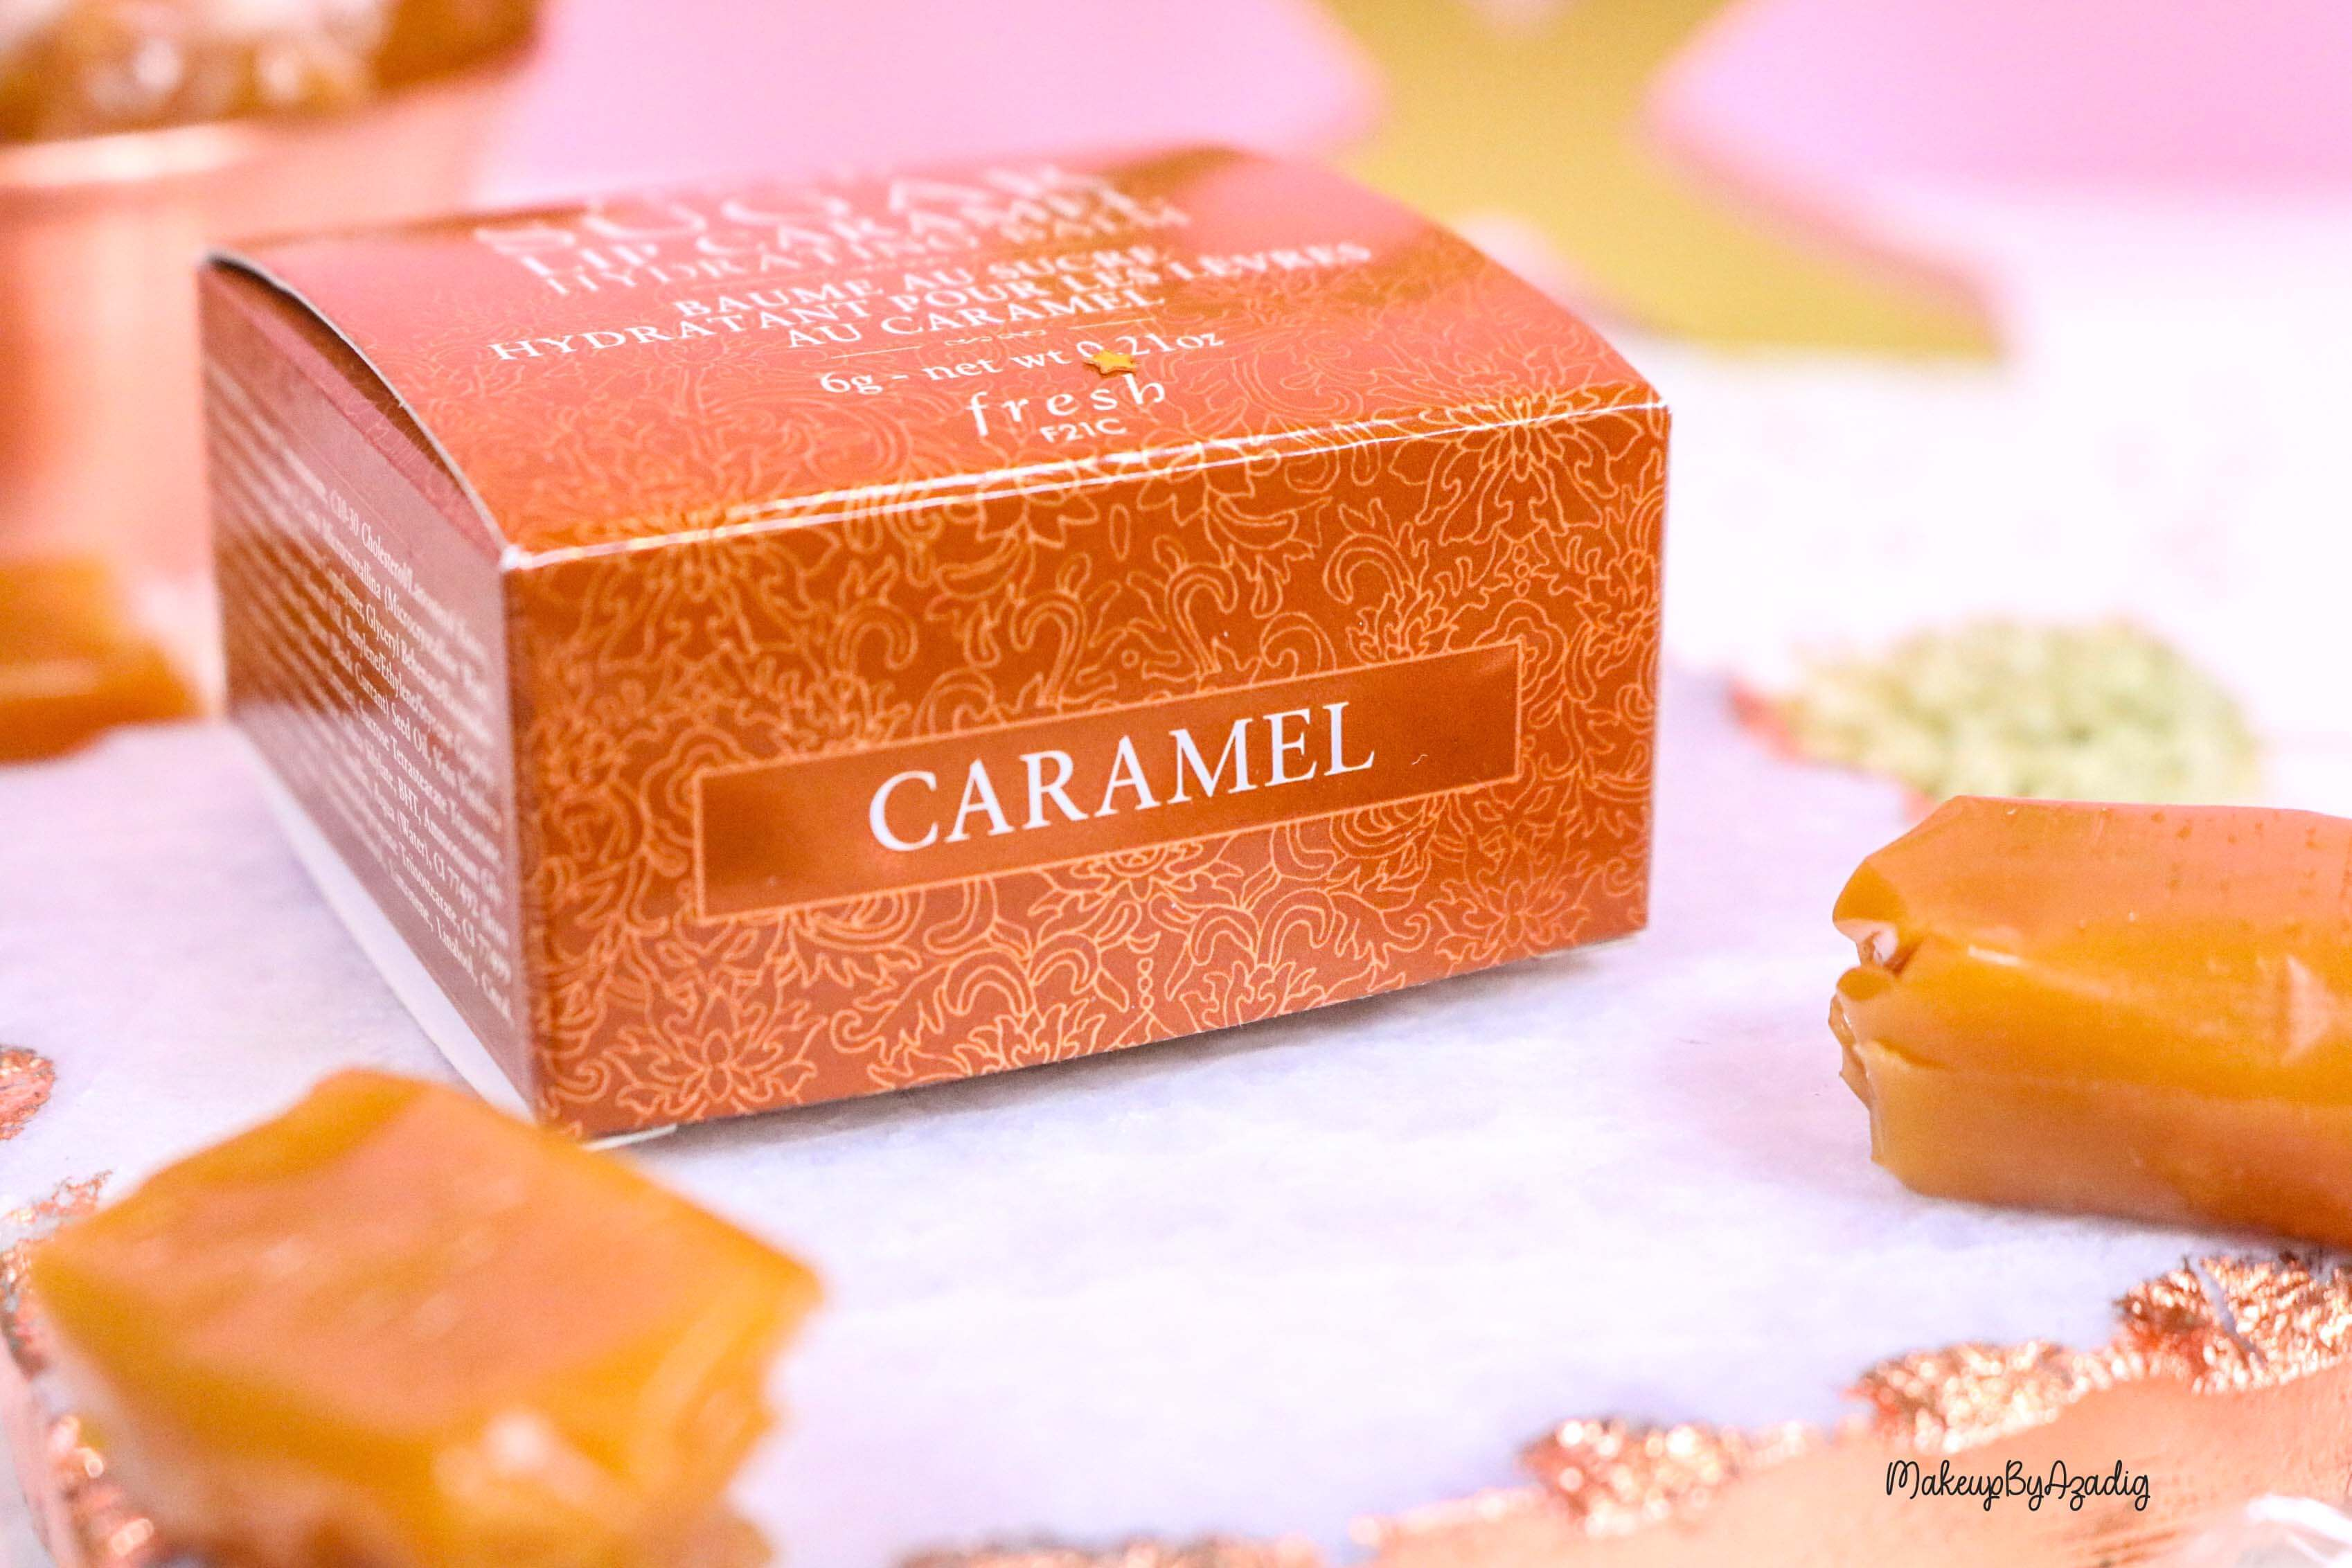 revue-baume-sucre-fresh-beauty-skincare-caramel-sugar-lip-caramel-sephora-makeupbyazadig-avis-prix-balm-gourmand